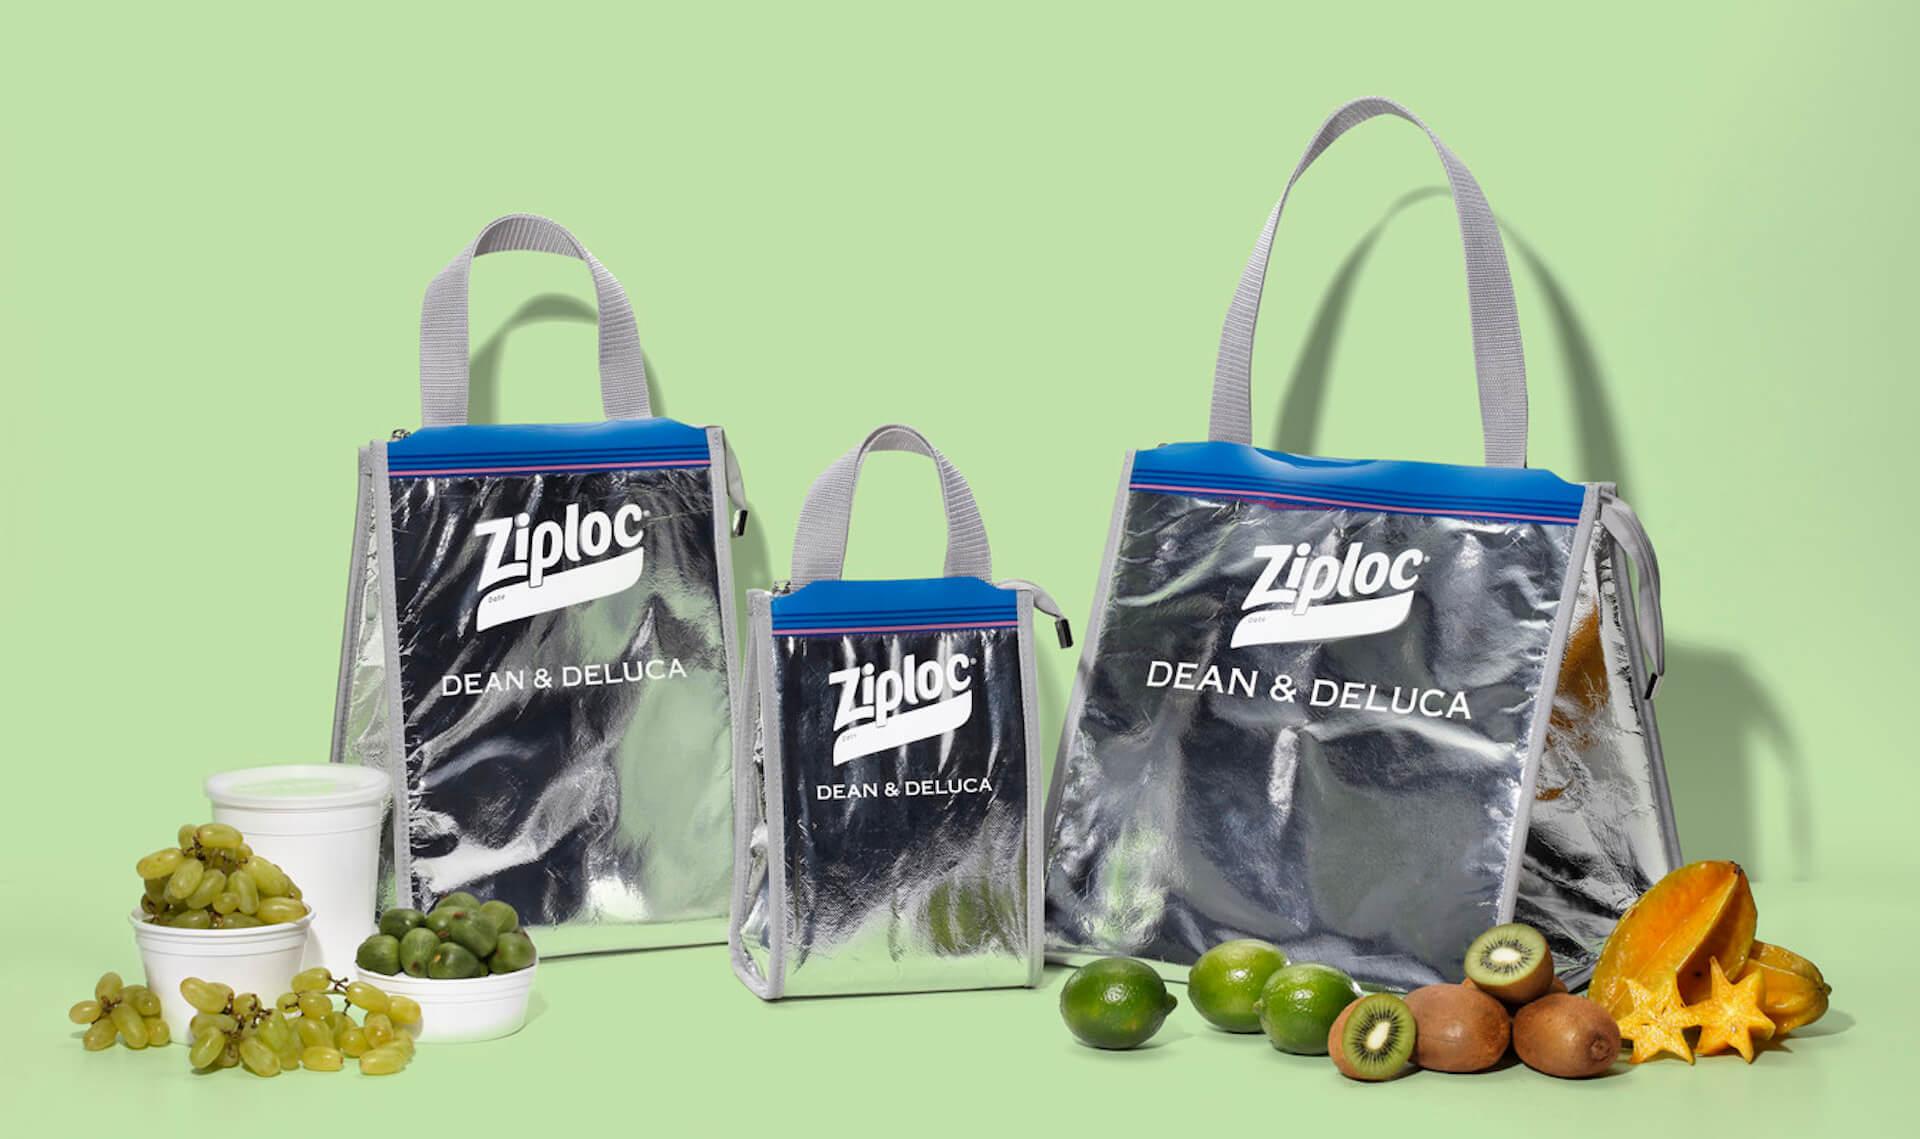 DEAN & DELUCAとBEAMS COUTURE、Ziplocのコラボクーラーバッグが再度登場!3サイズ展開で発売決定 life210419_deananddeluca_beams_ziploc_1